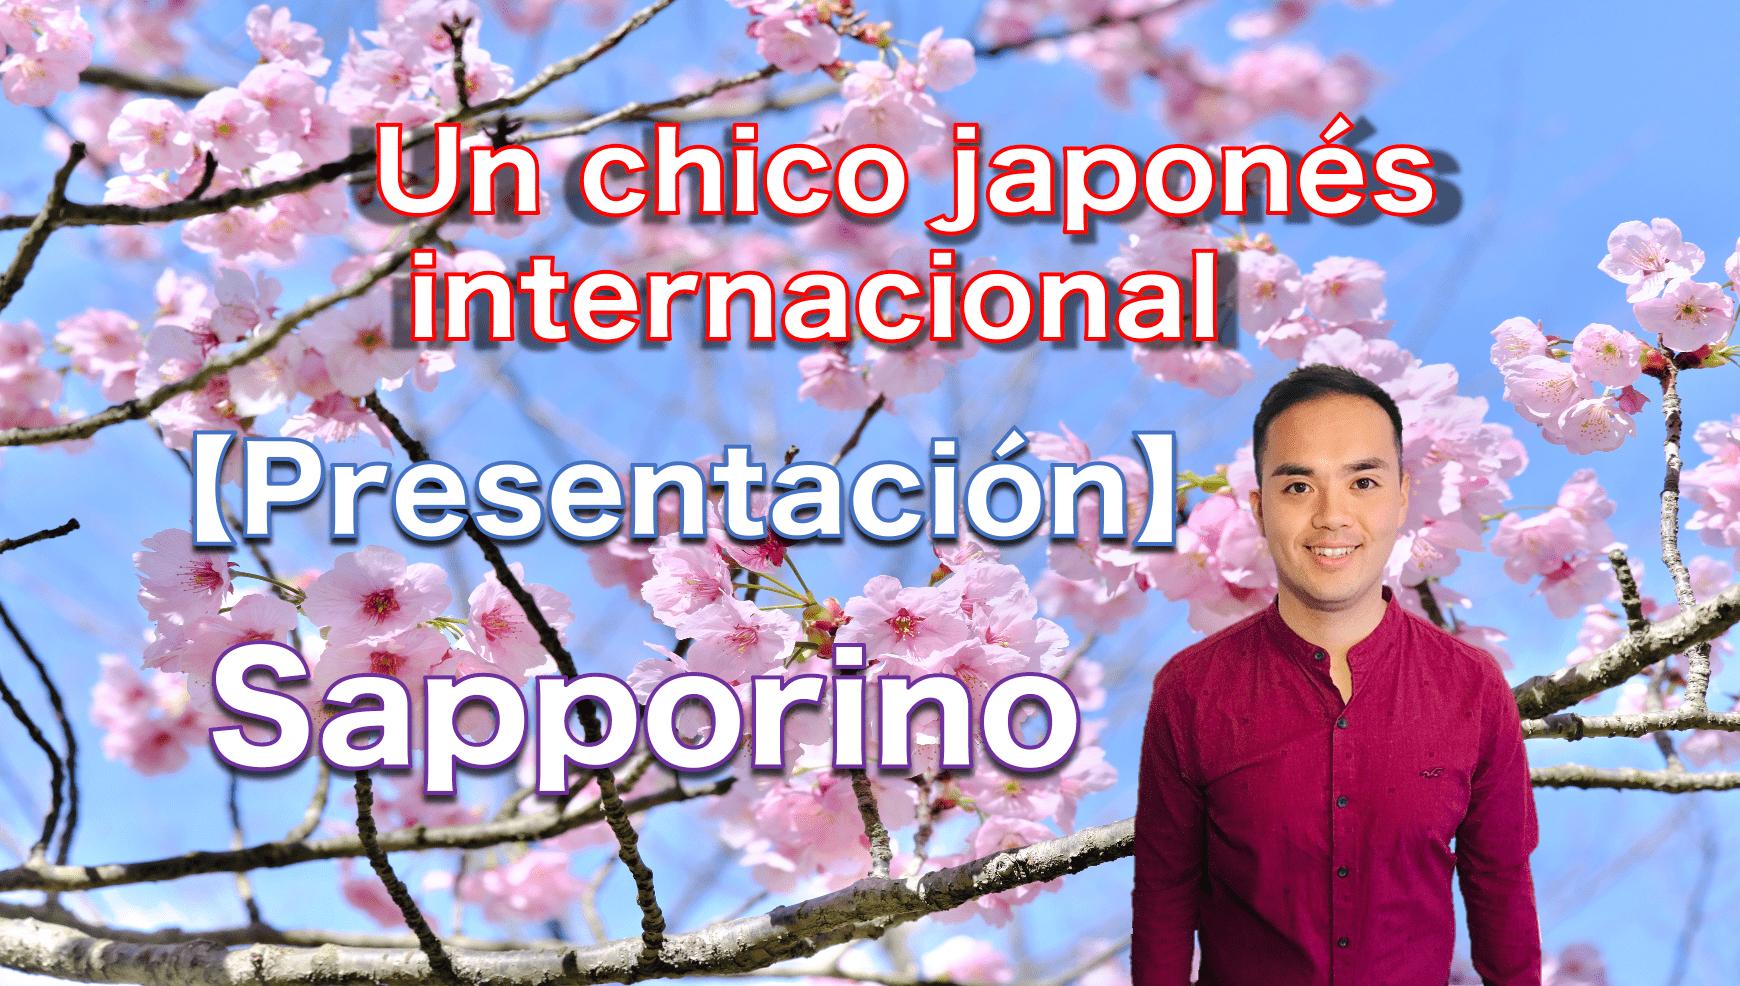 Un chico japonés internacional 【Presentación de Sapporino】